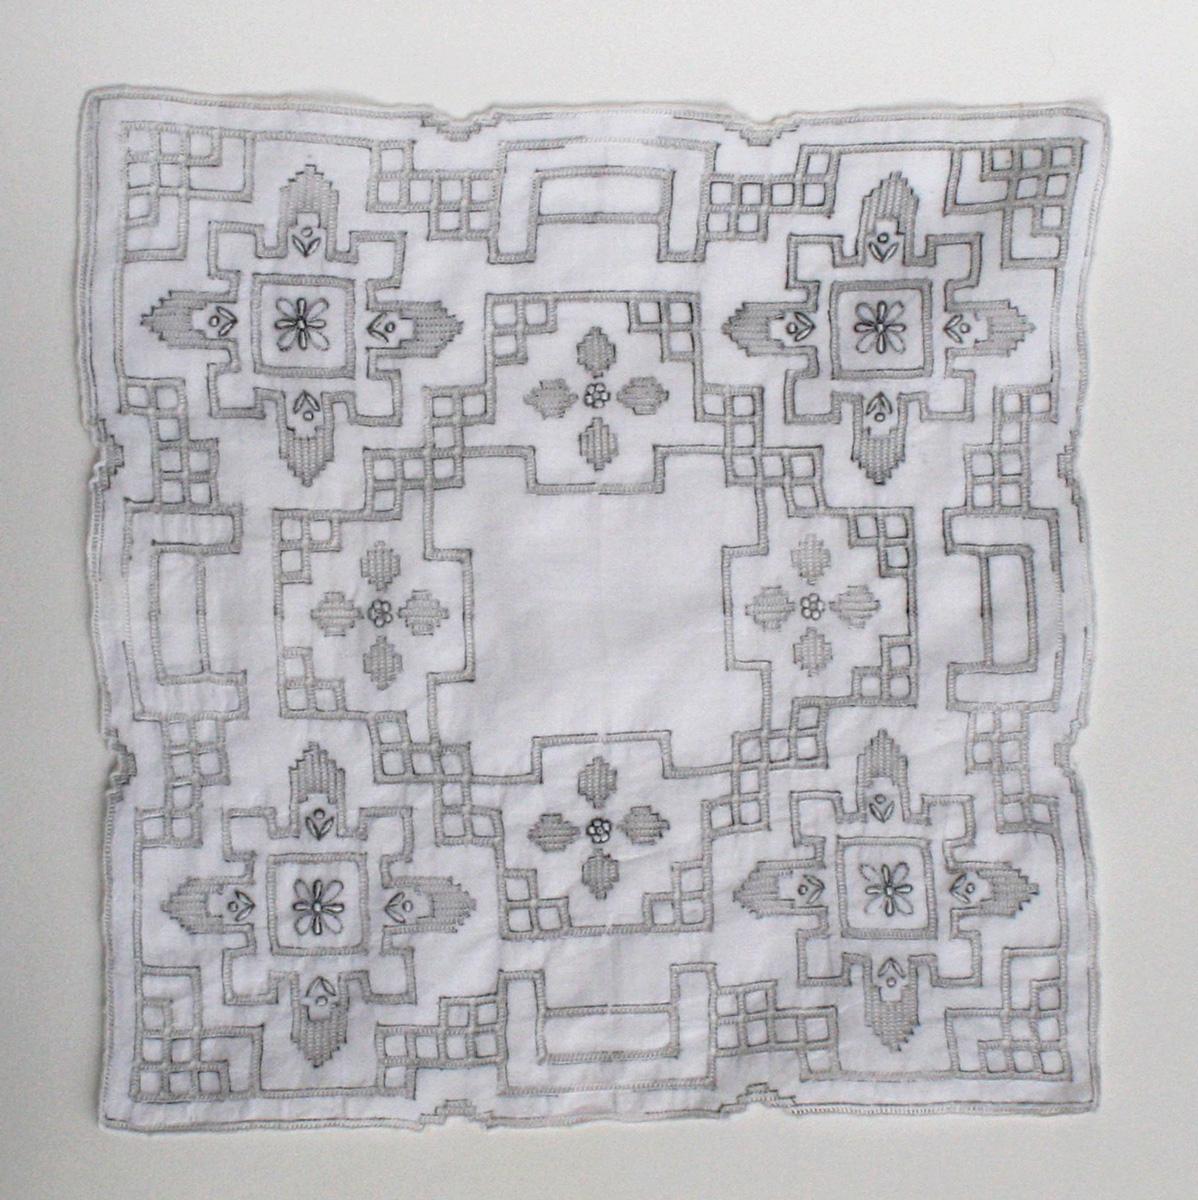 franse zakdoek uit jaren 50-60